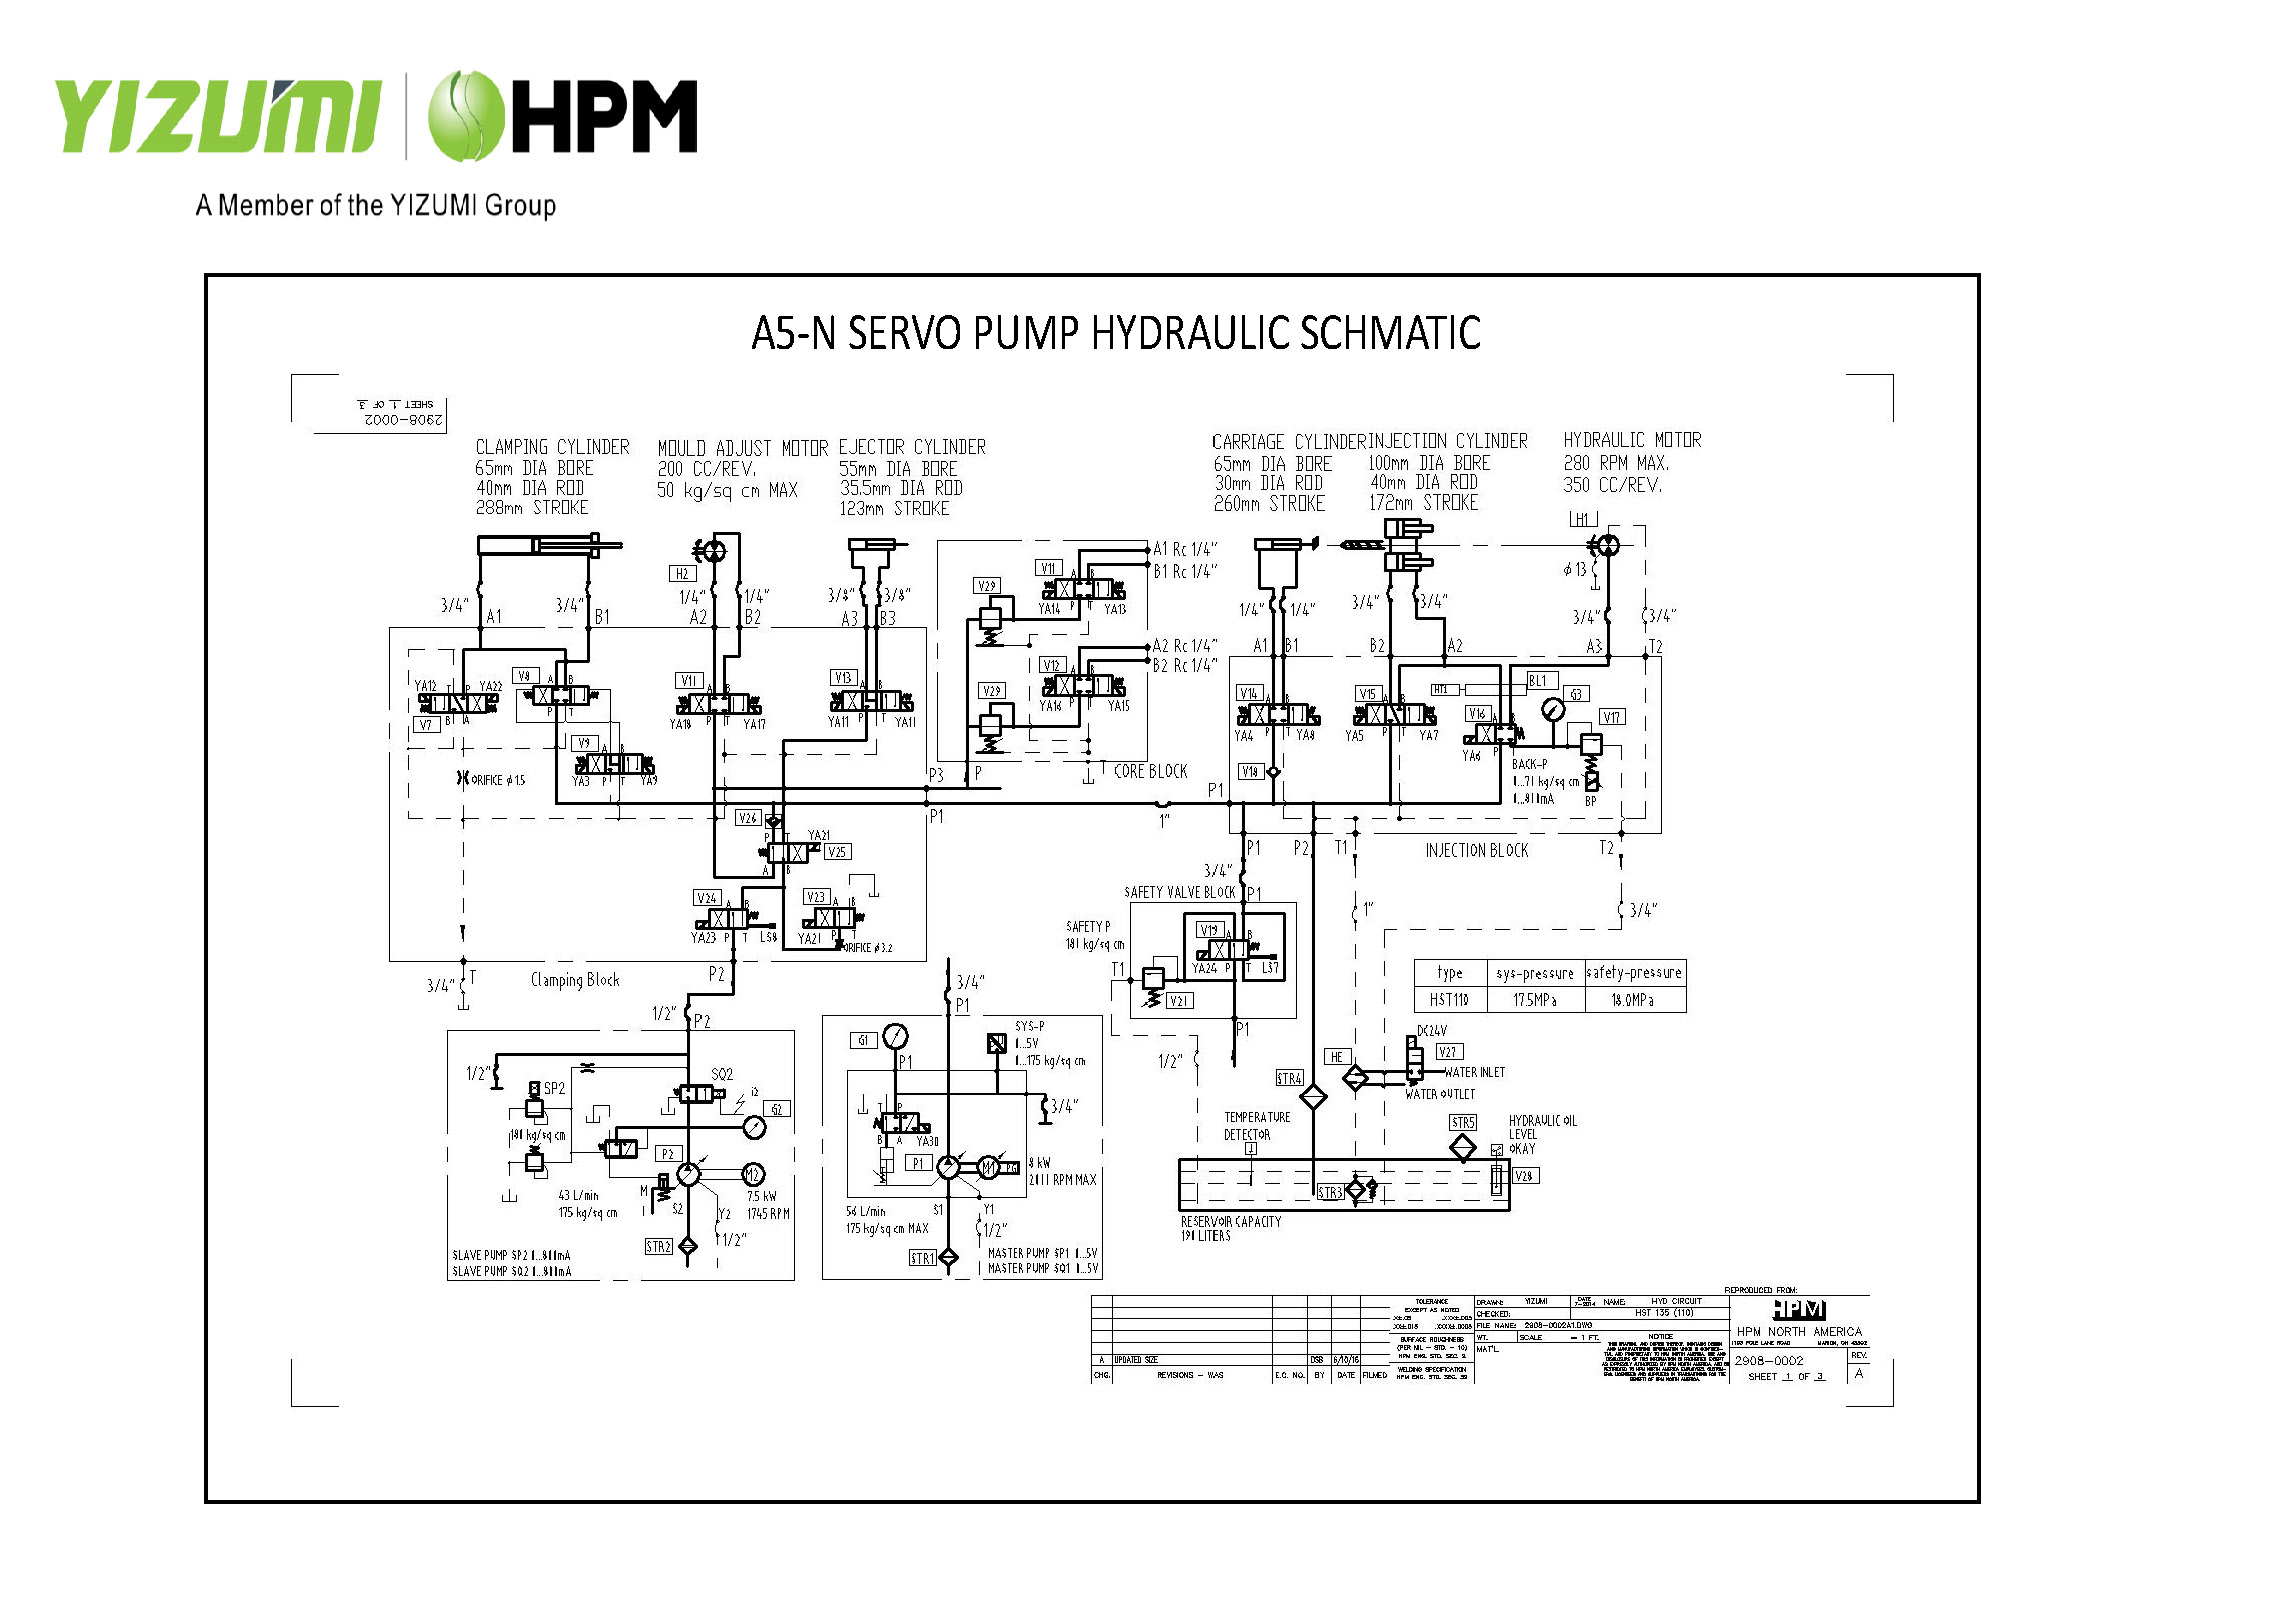 Injection Molding Machine Electrical Usage Streamline